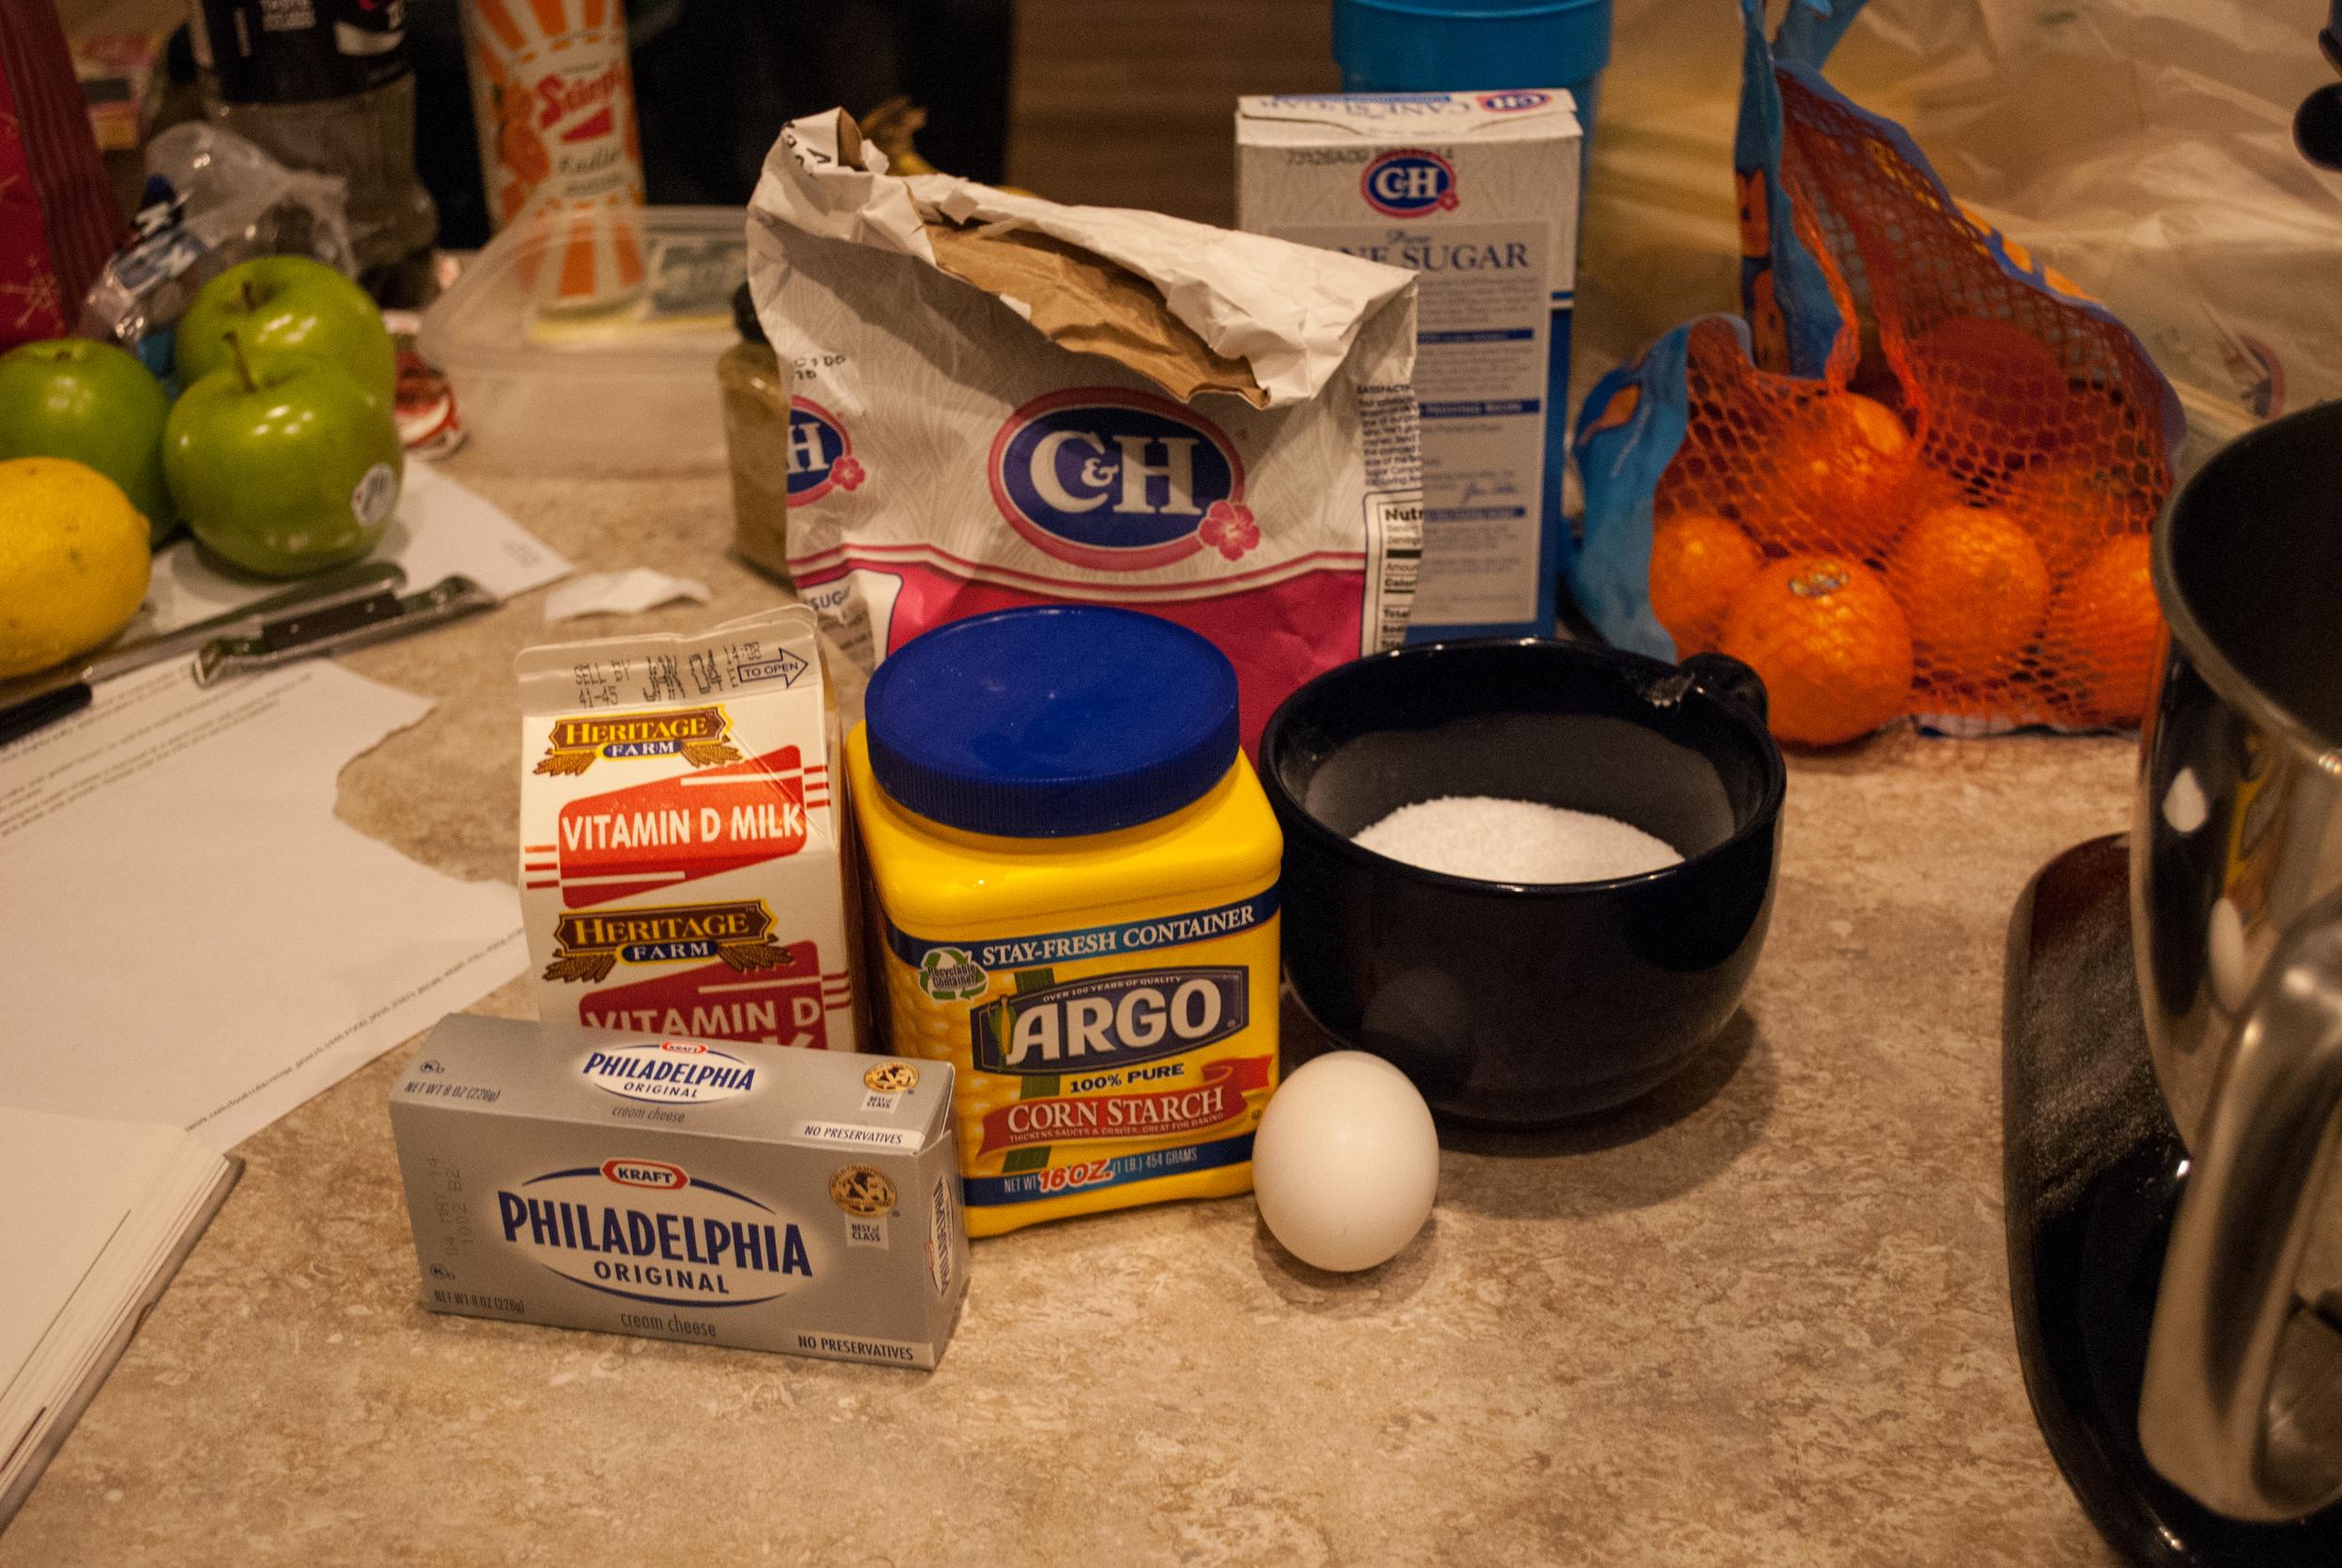 Liquid cheesecake ingredients